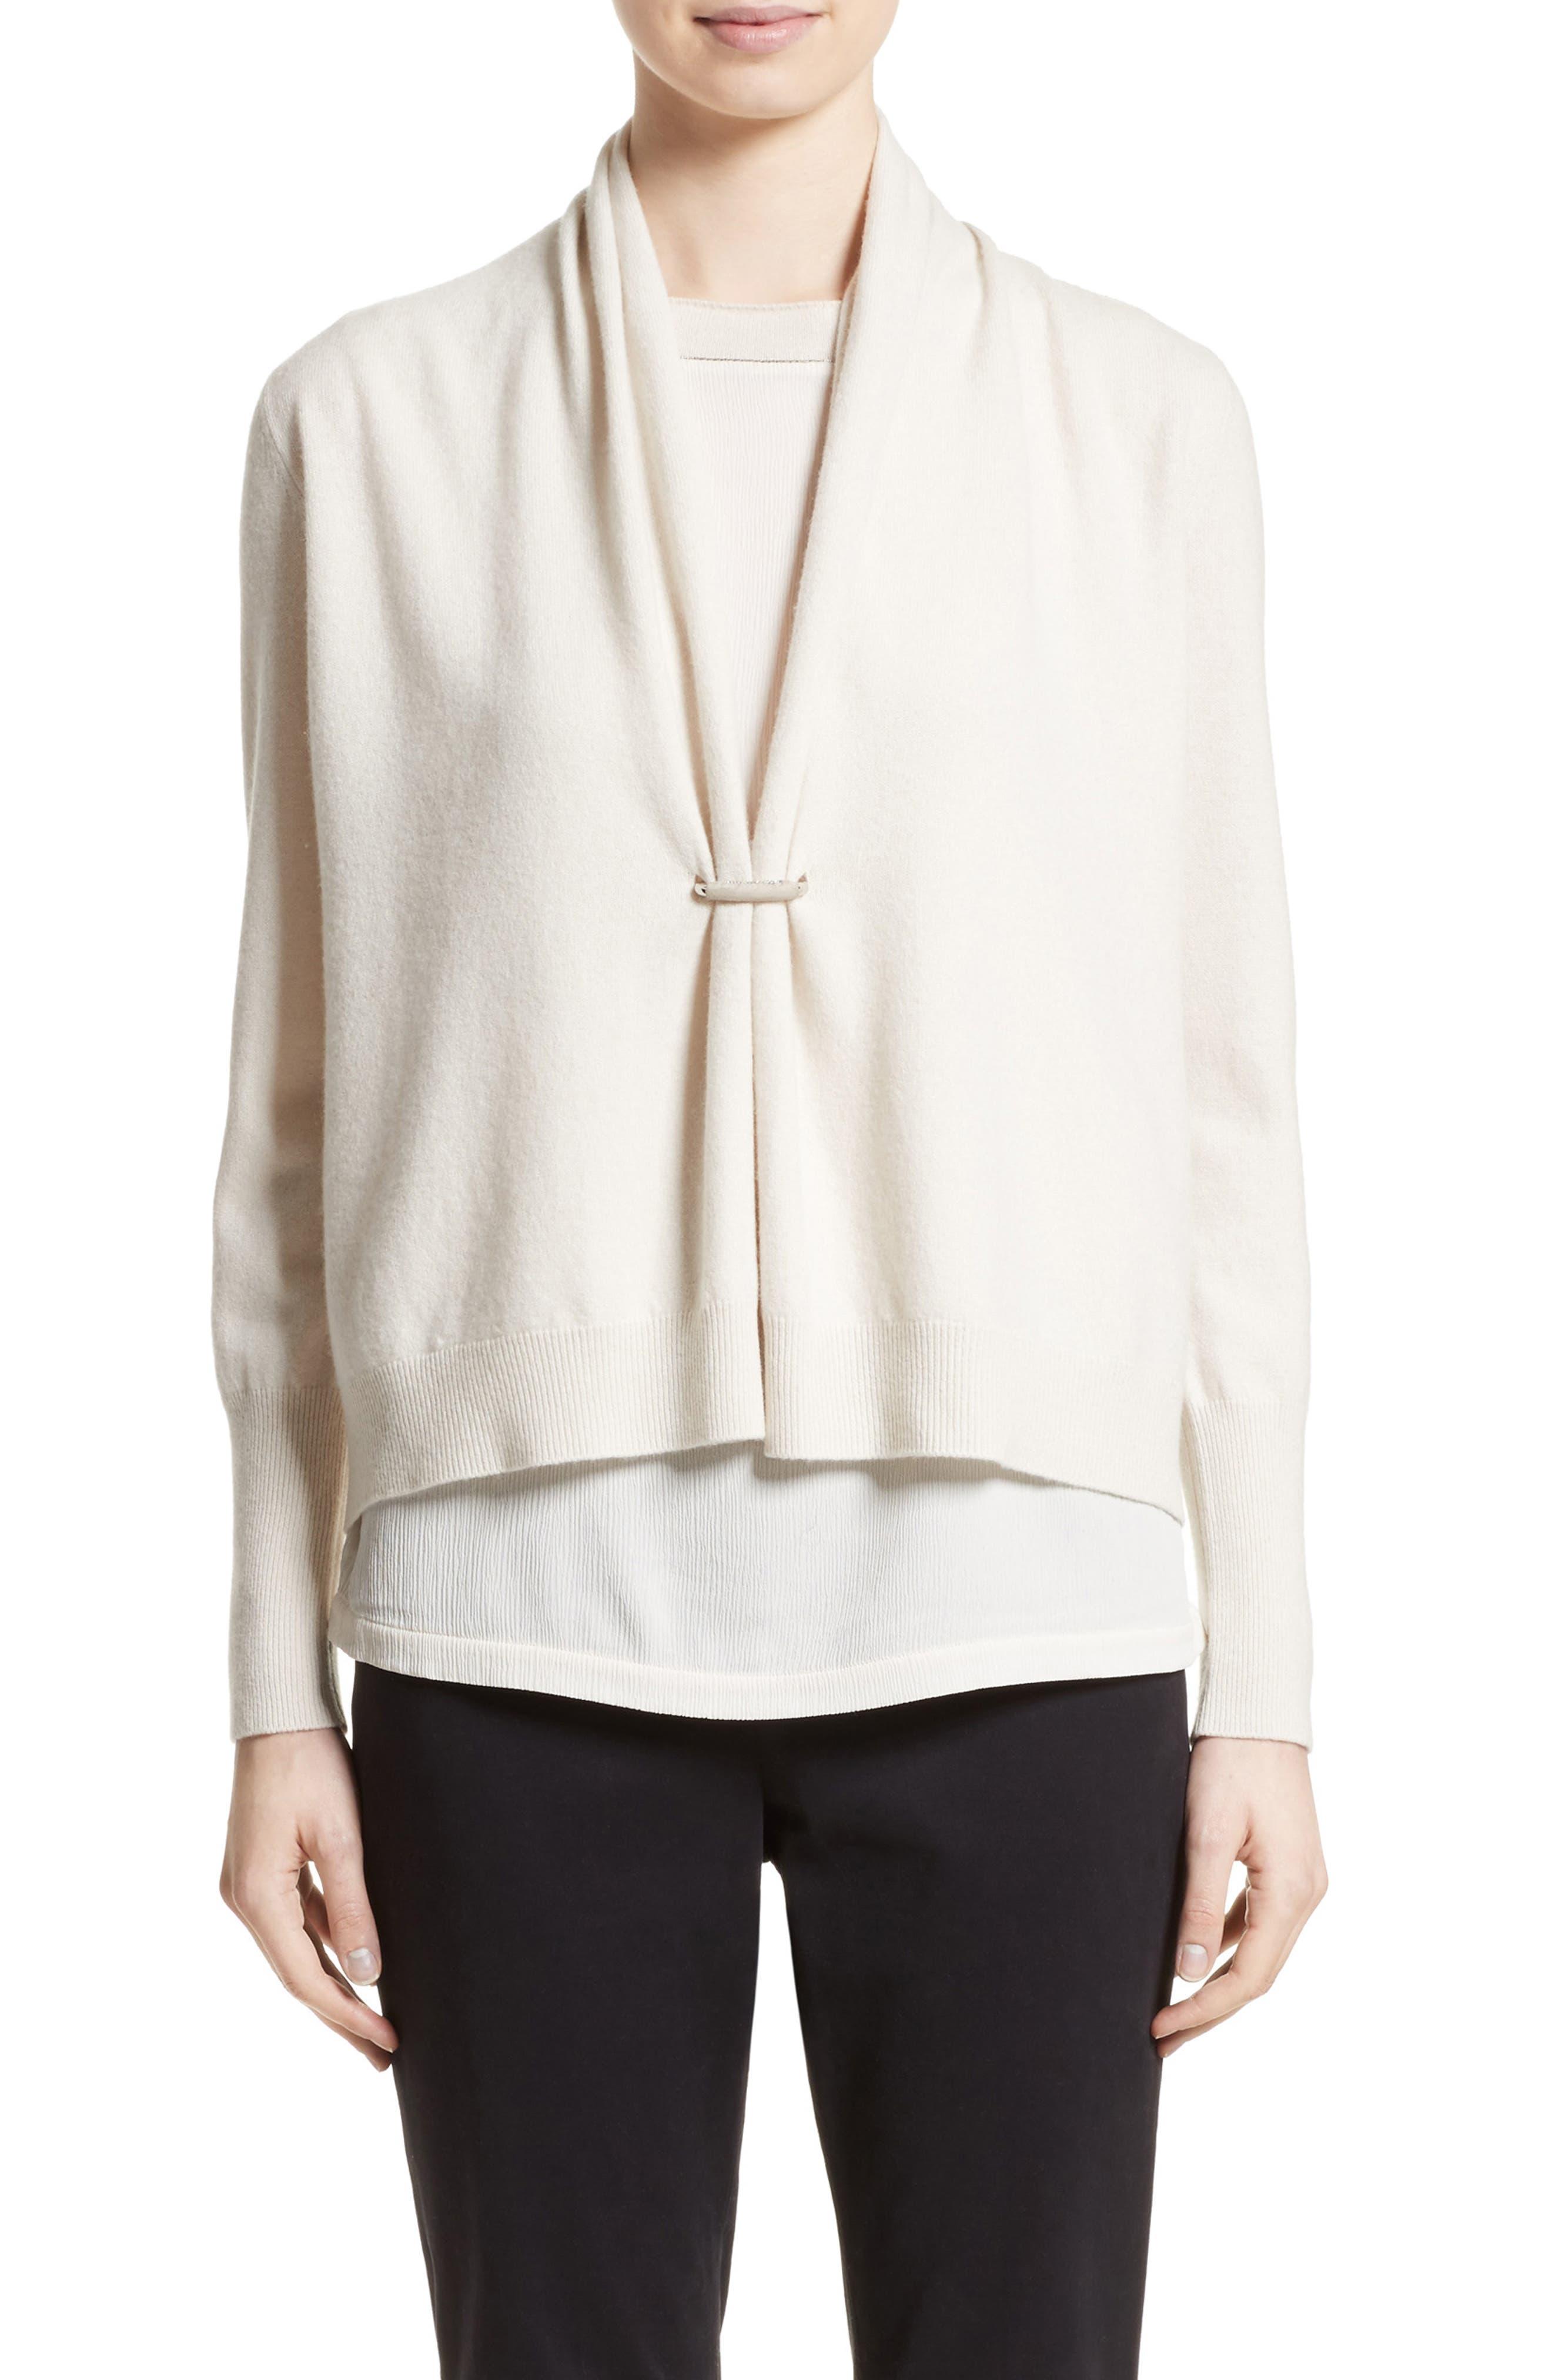 Wool, Silk & Cashmere Shawl Collar Cardigan,                             Main thumbnail 1, color,                             101